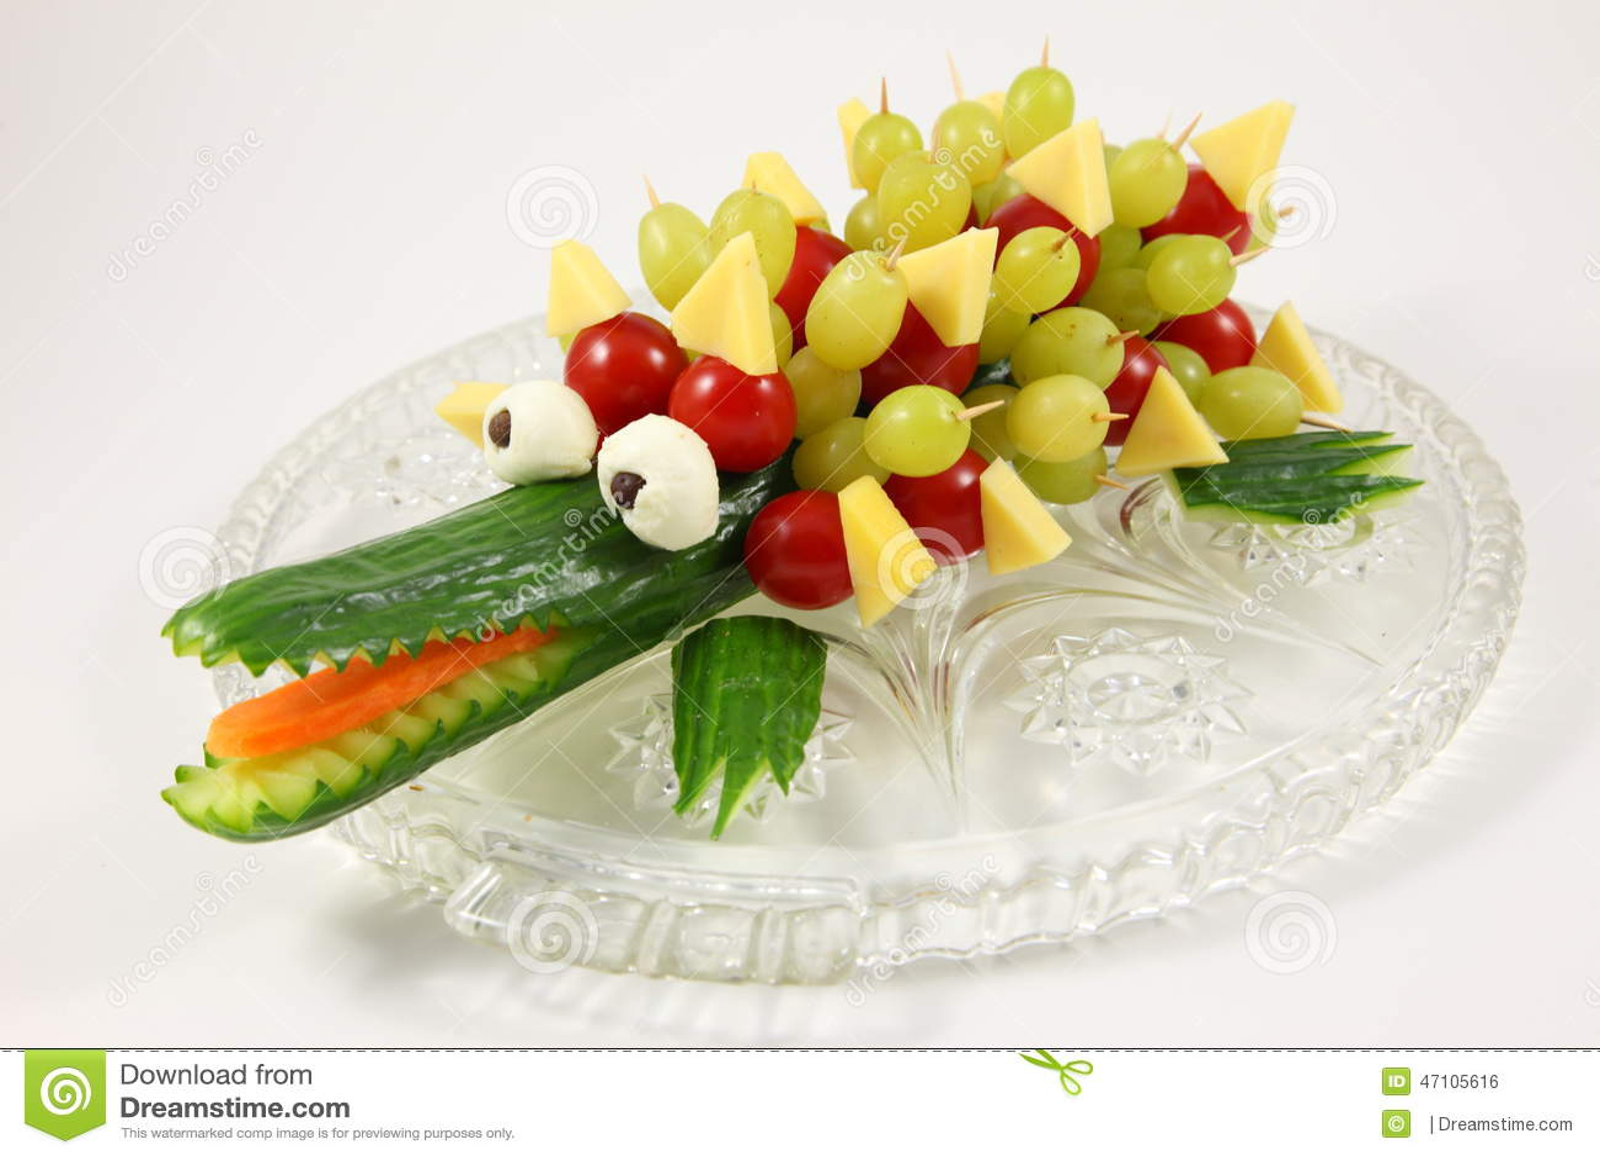 Cucumber Crocodile Stock Photo Image 47105616